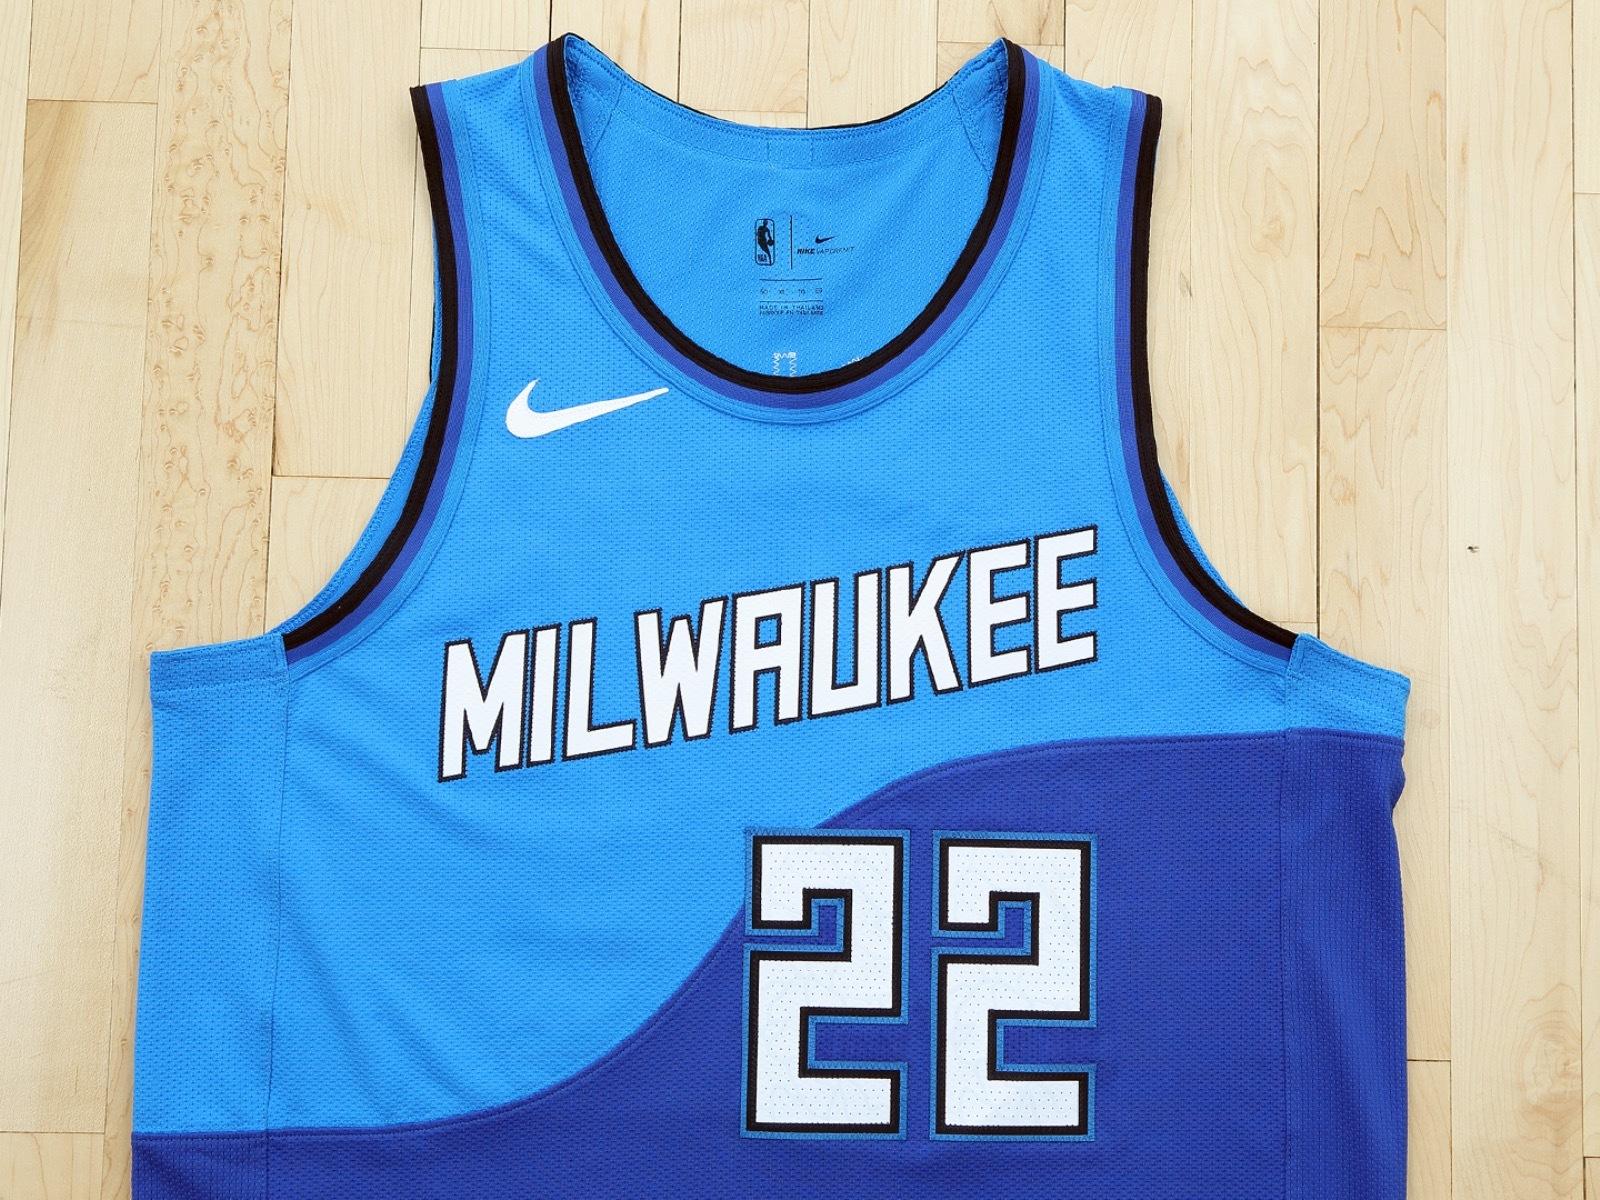 Making waves: Bucks reveal new 2020-21 alternate City Edition jersey